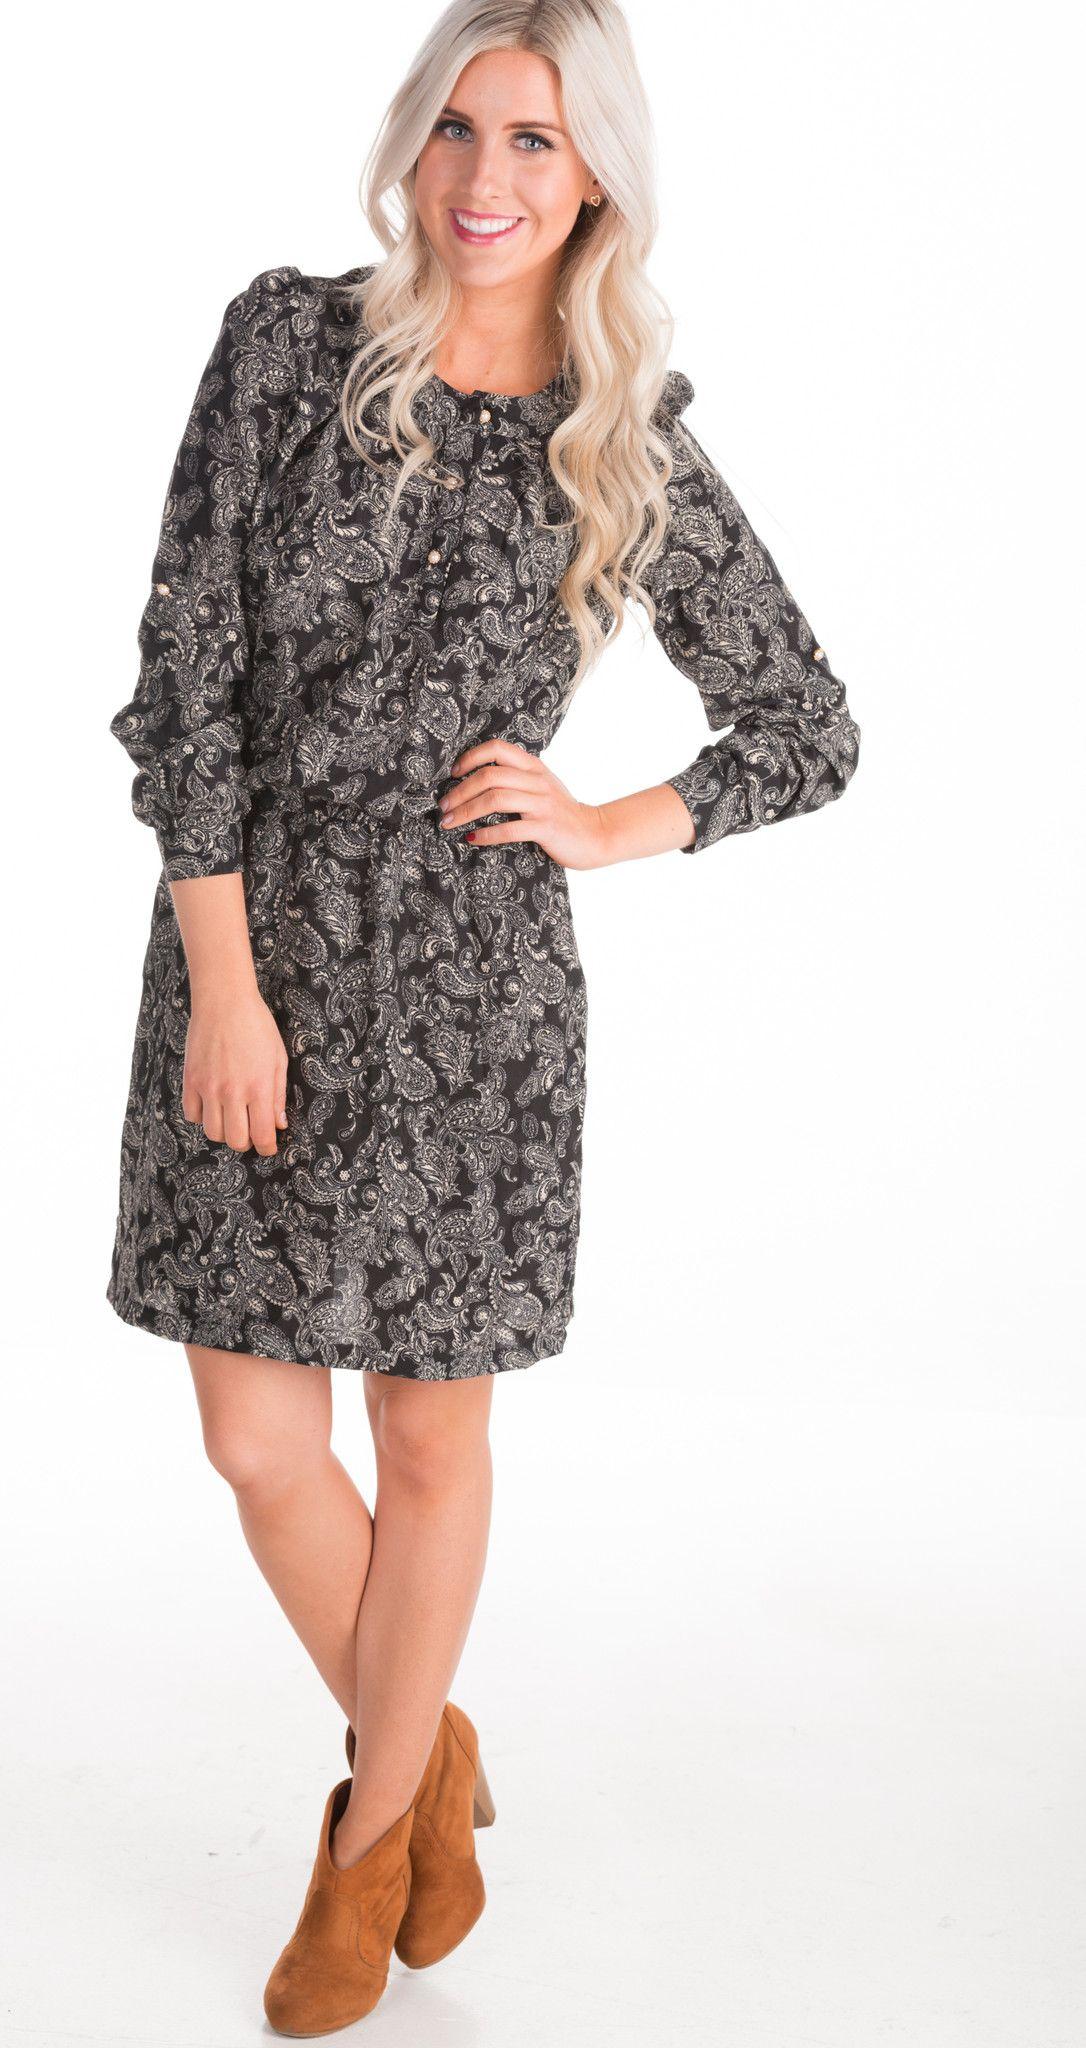 Annalee Tunic Dress | SexyModest Boutique